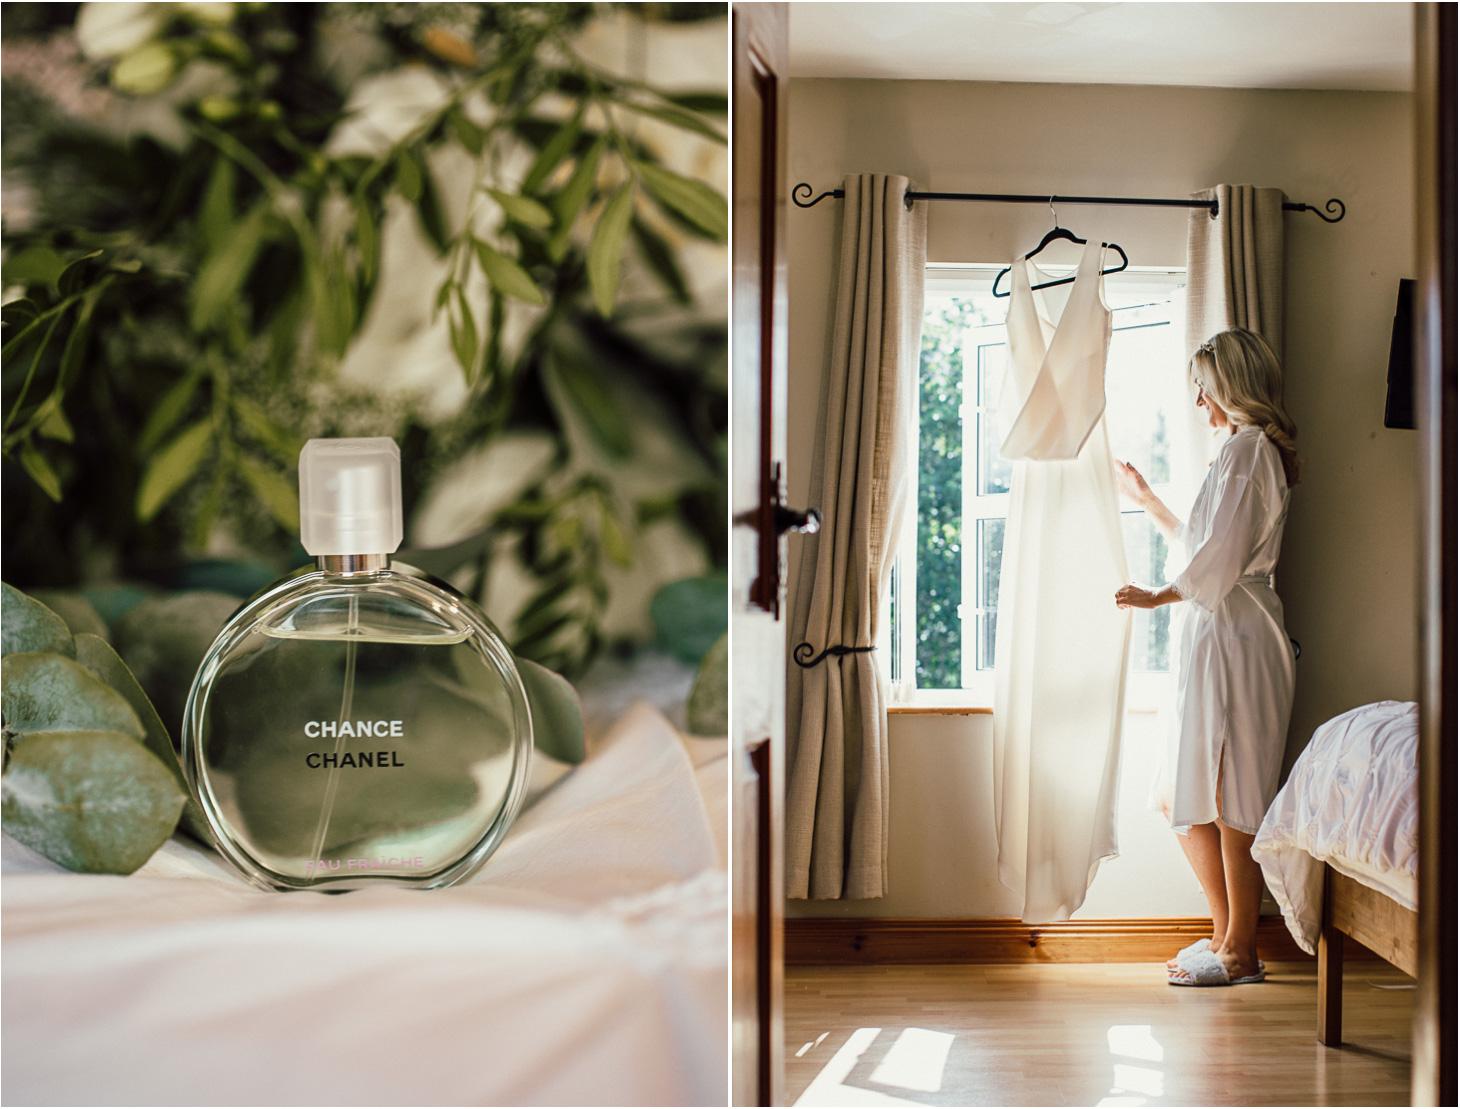 Virgina Lodge Photography. darren fitzpatrick. Wedding.2